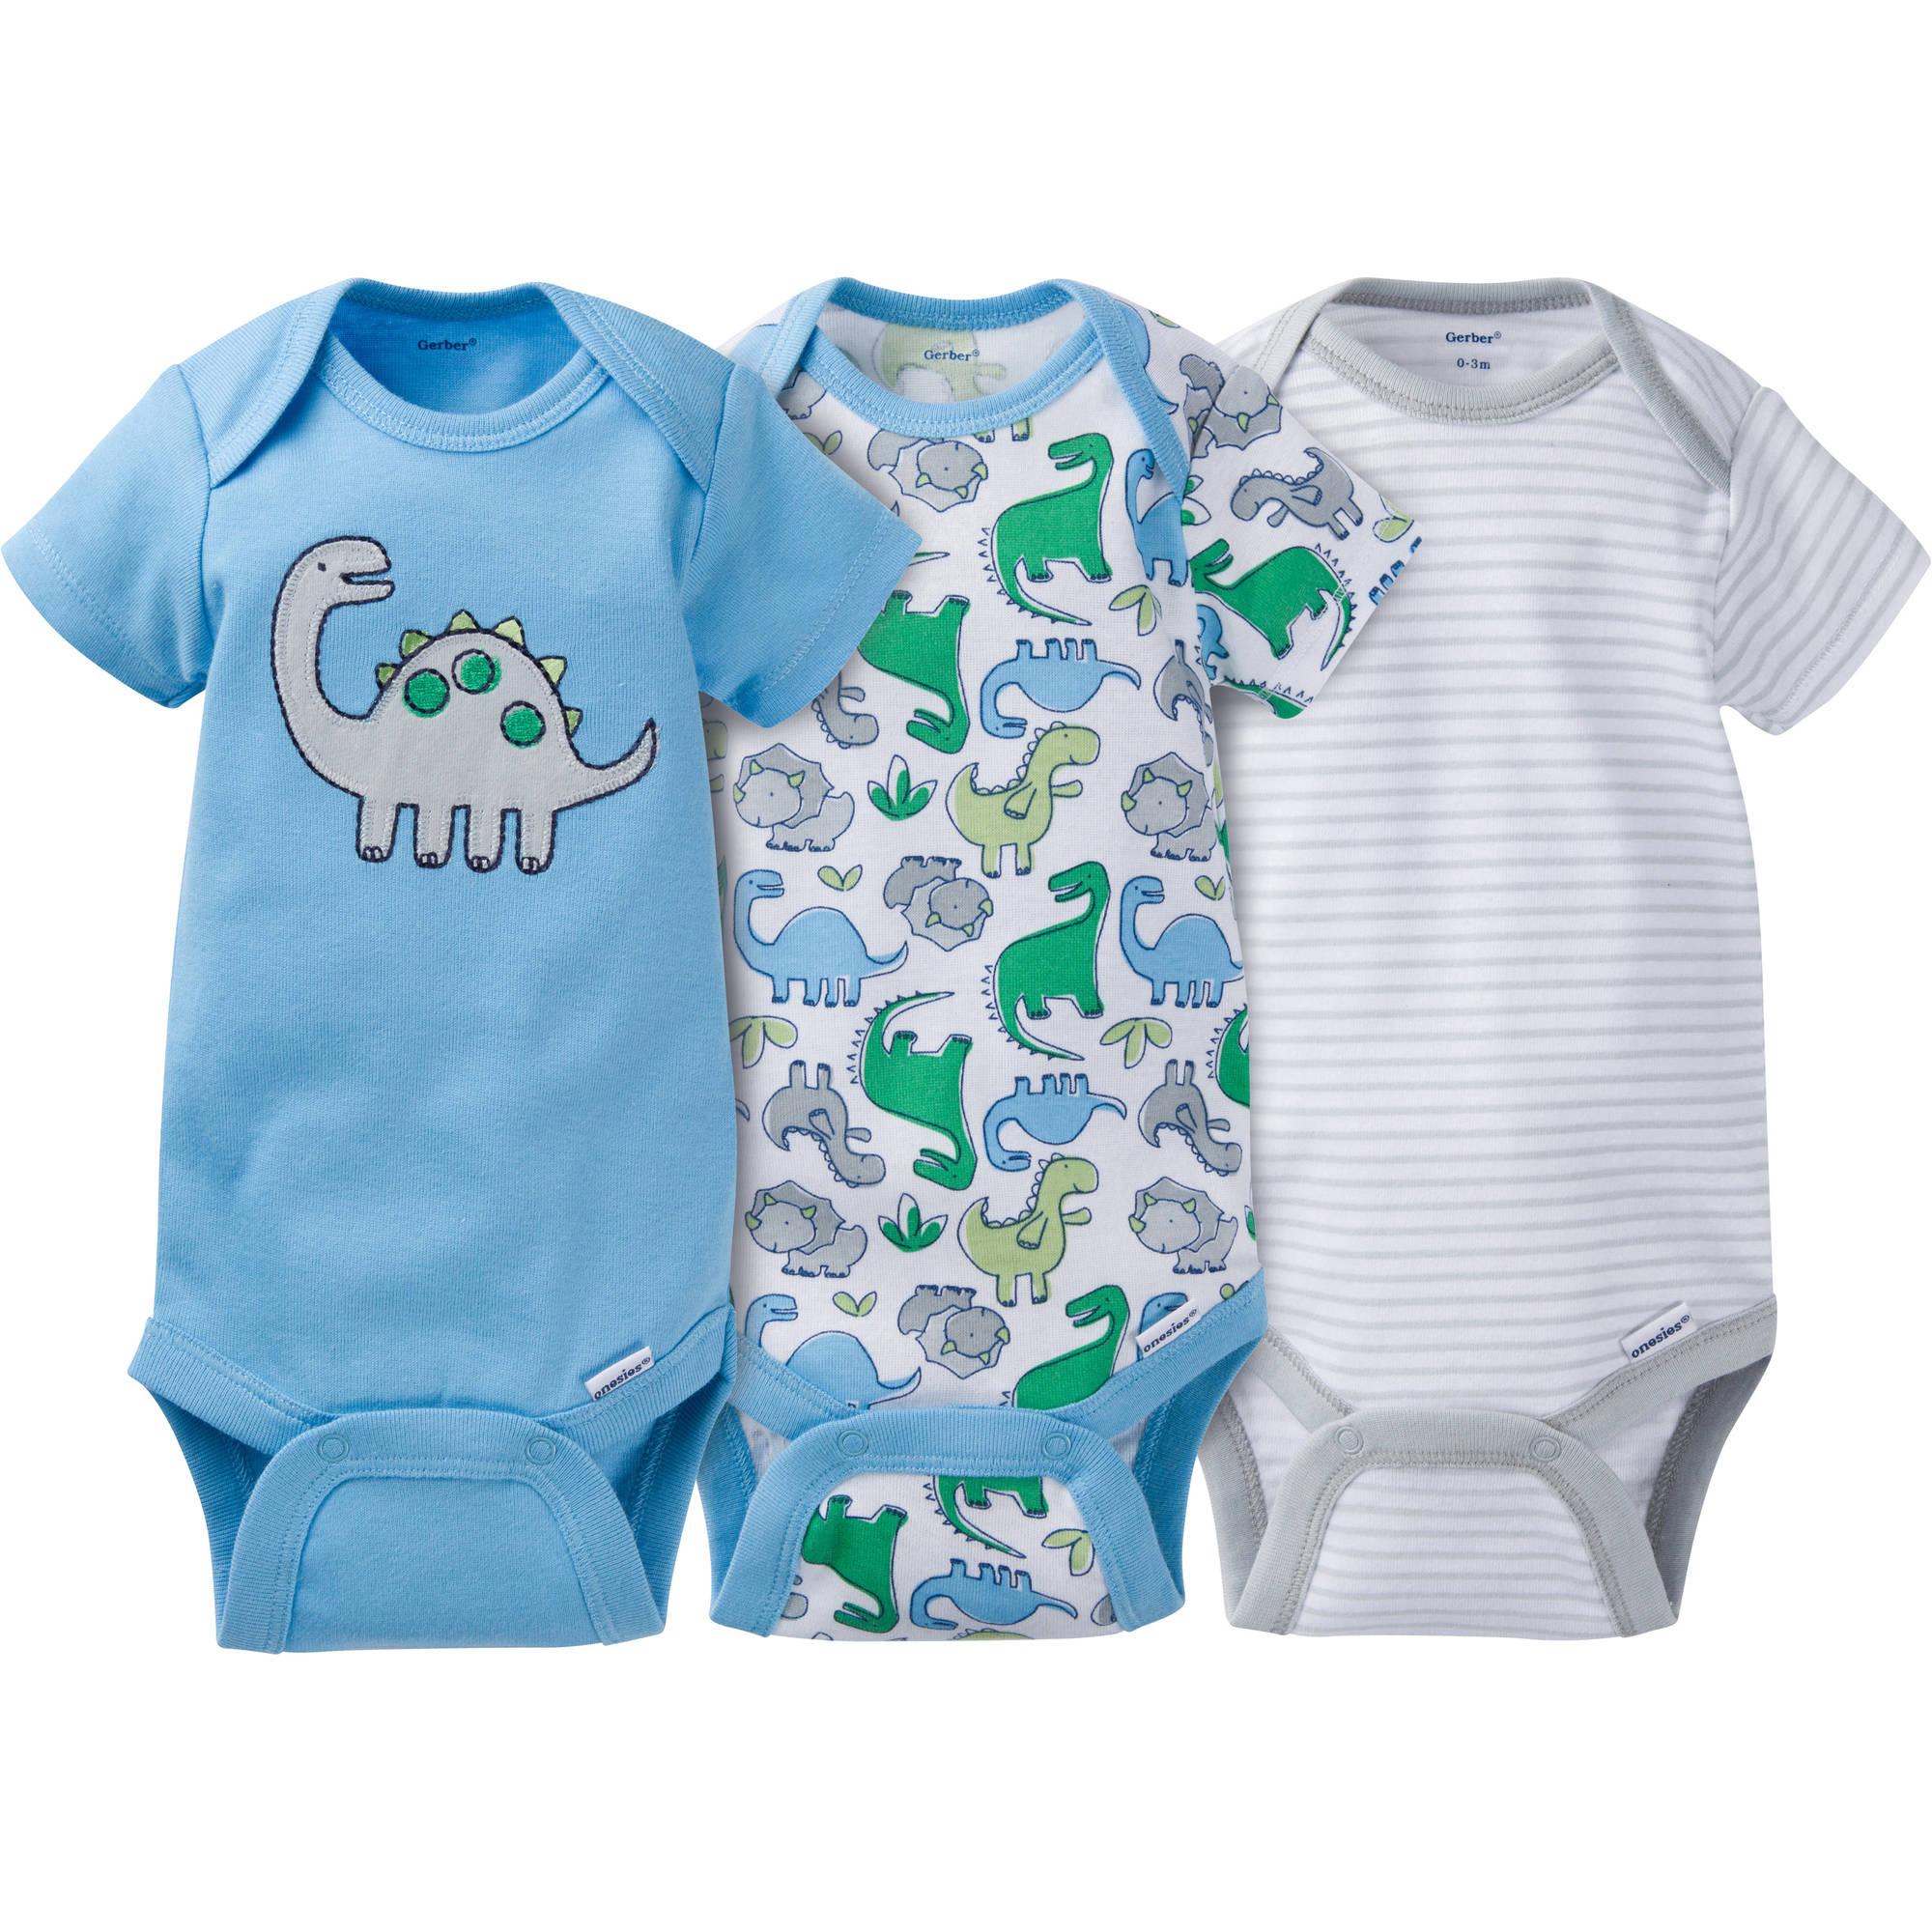 Gerber Newborn Baby Boy Onesies Bodysuits Assorted, 3-Pack